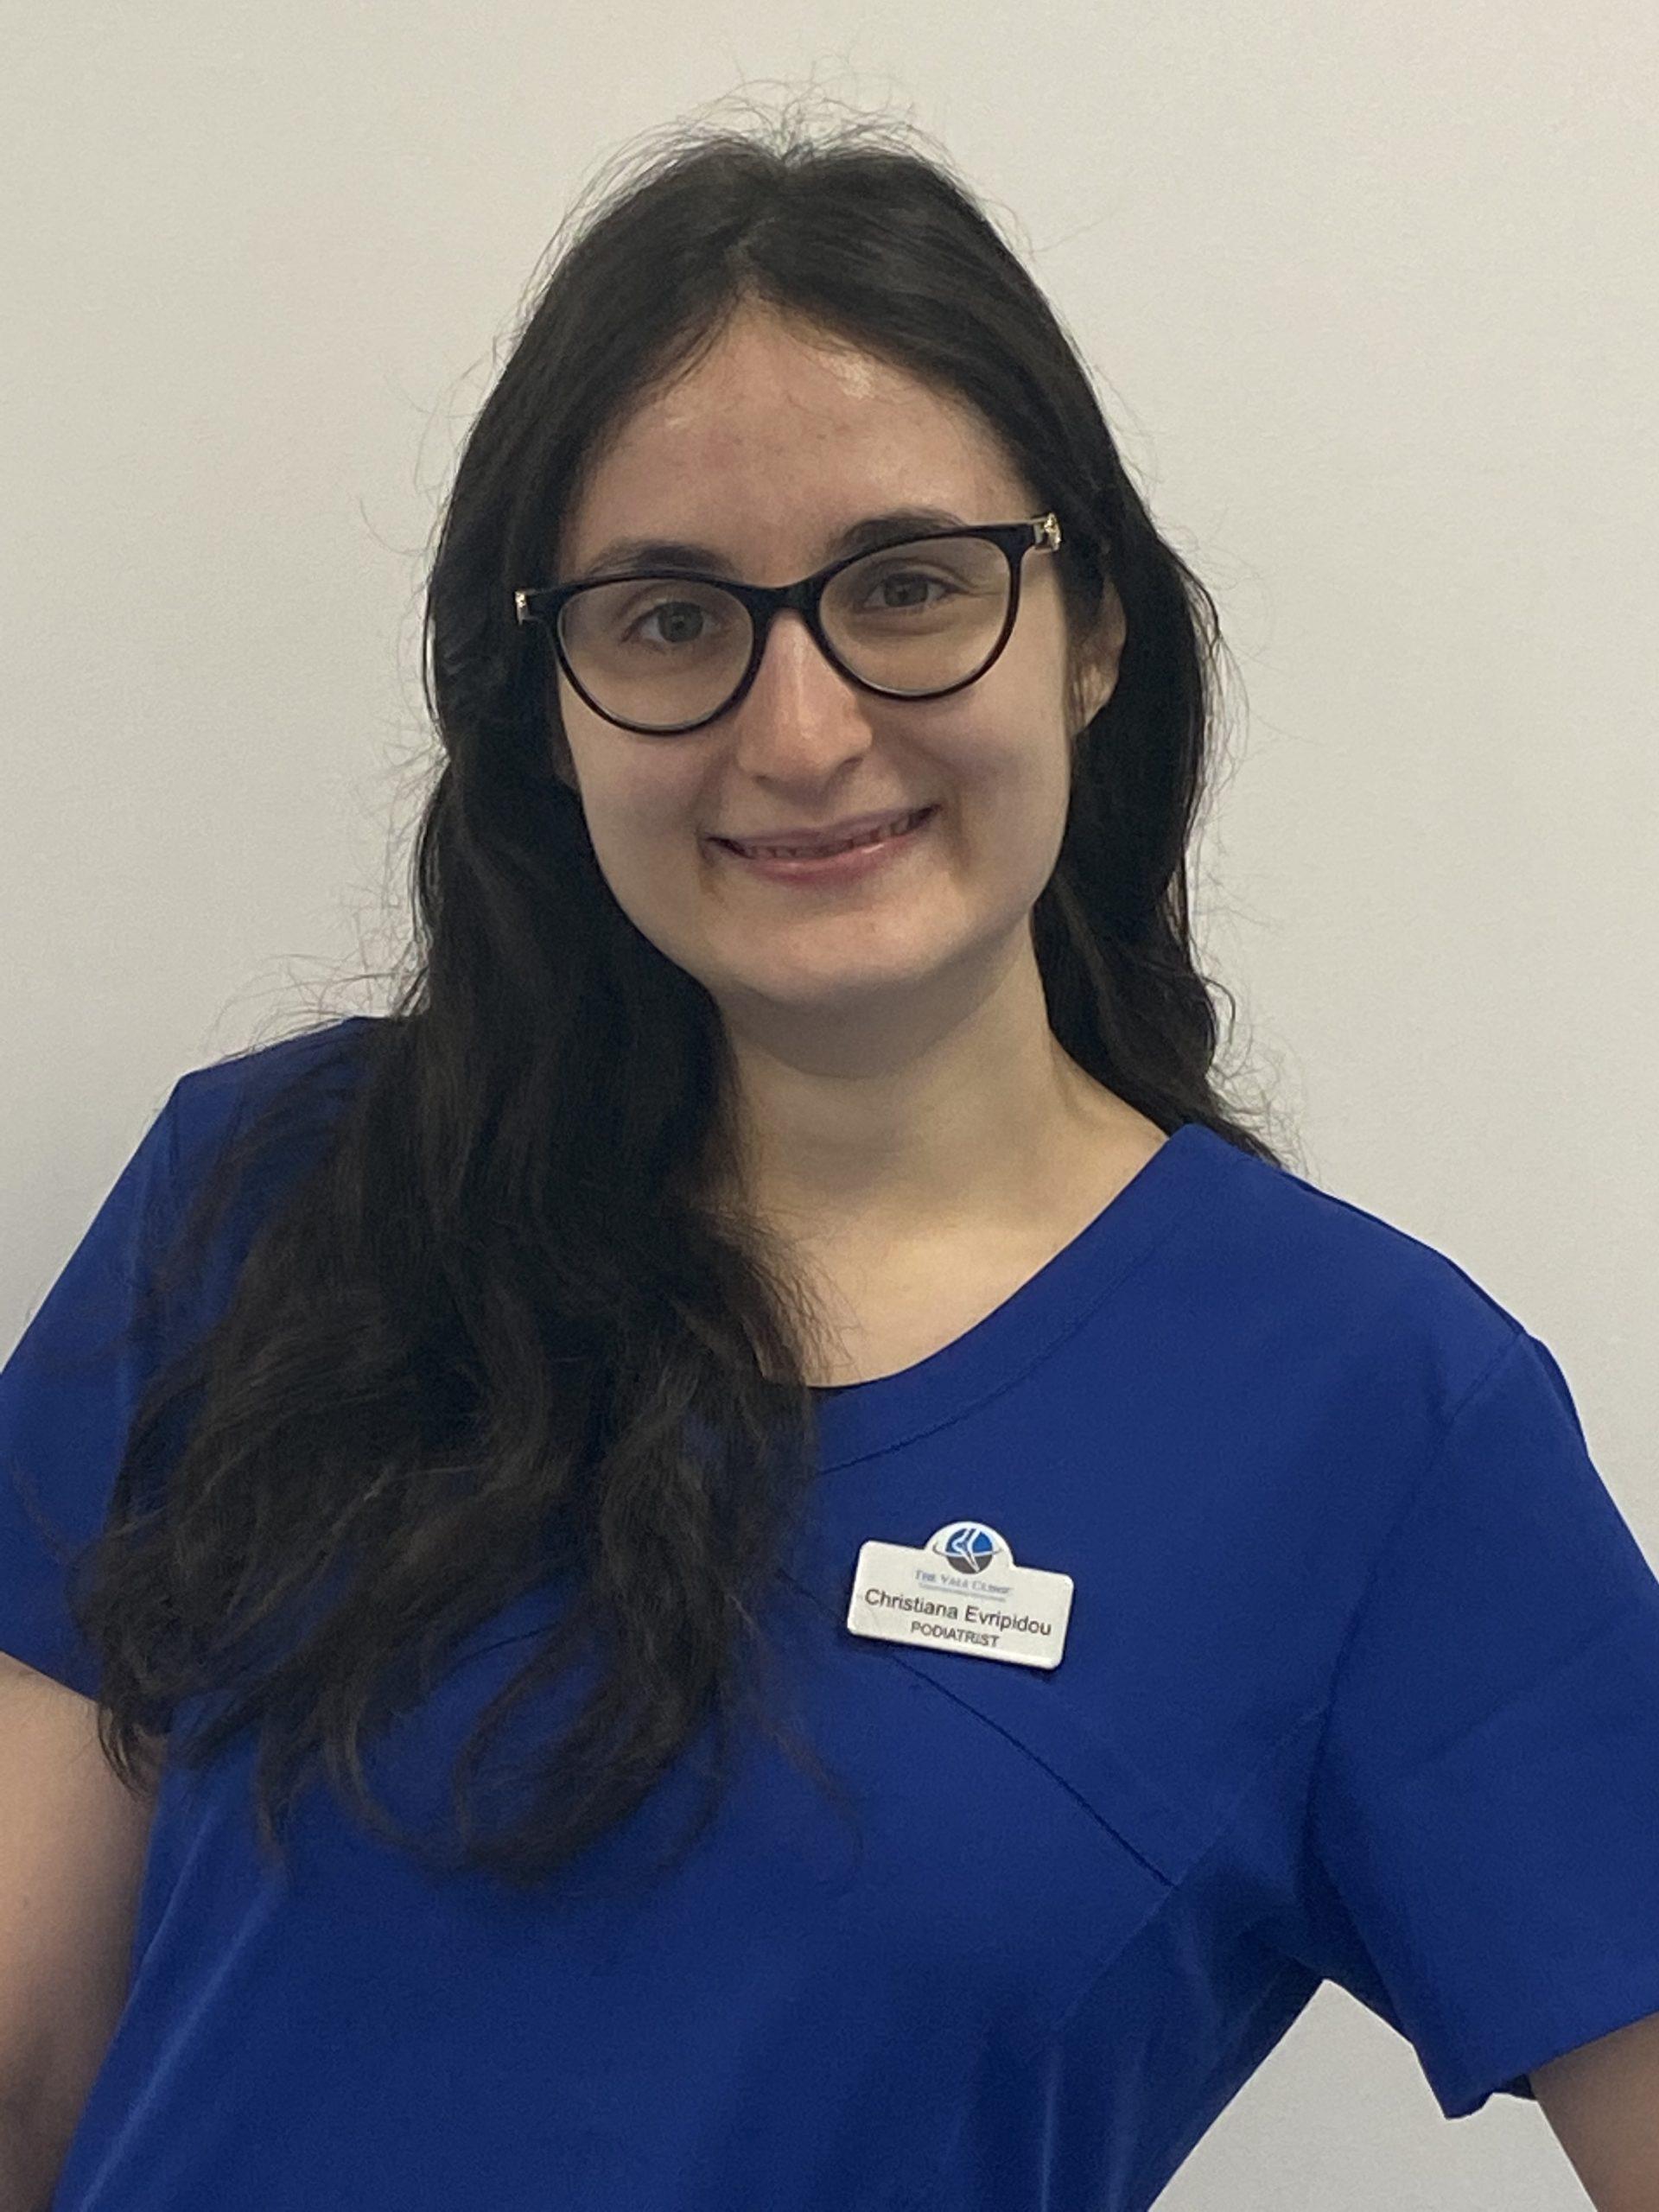 Christiana Podiatrist at the Vale Clinic